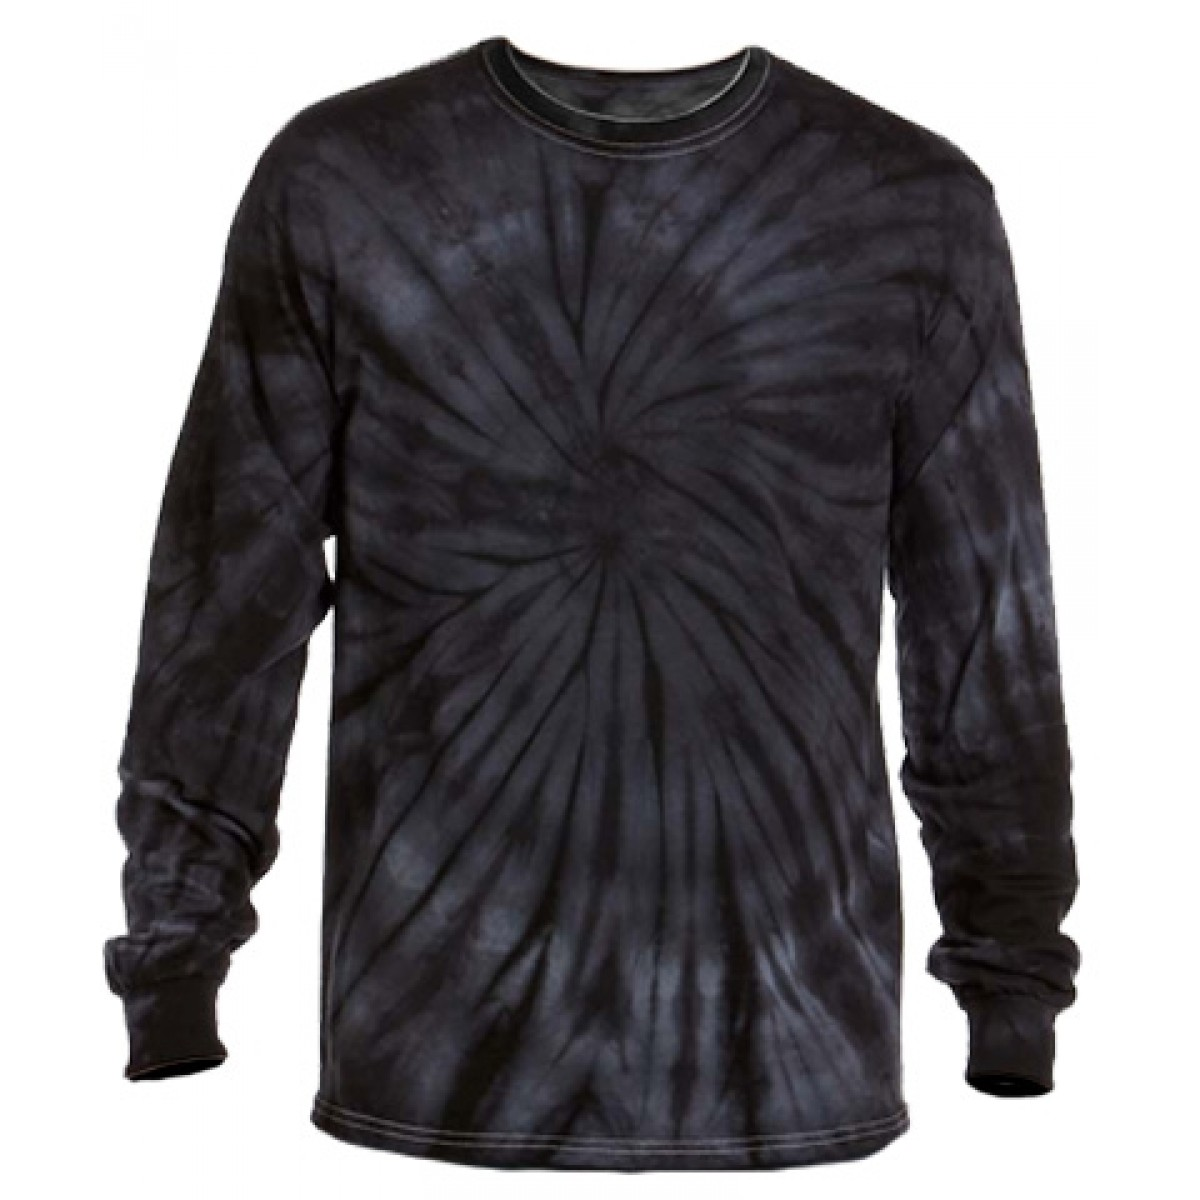 Multi Color Tie-Dye Long Sleeve Shirt -Gray -2XL